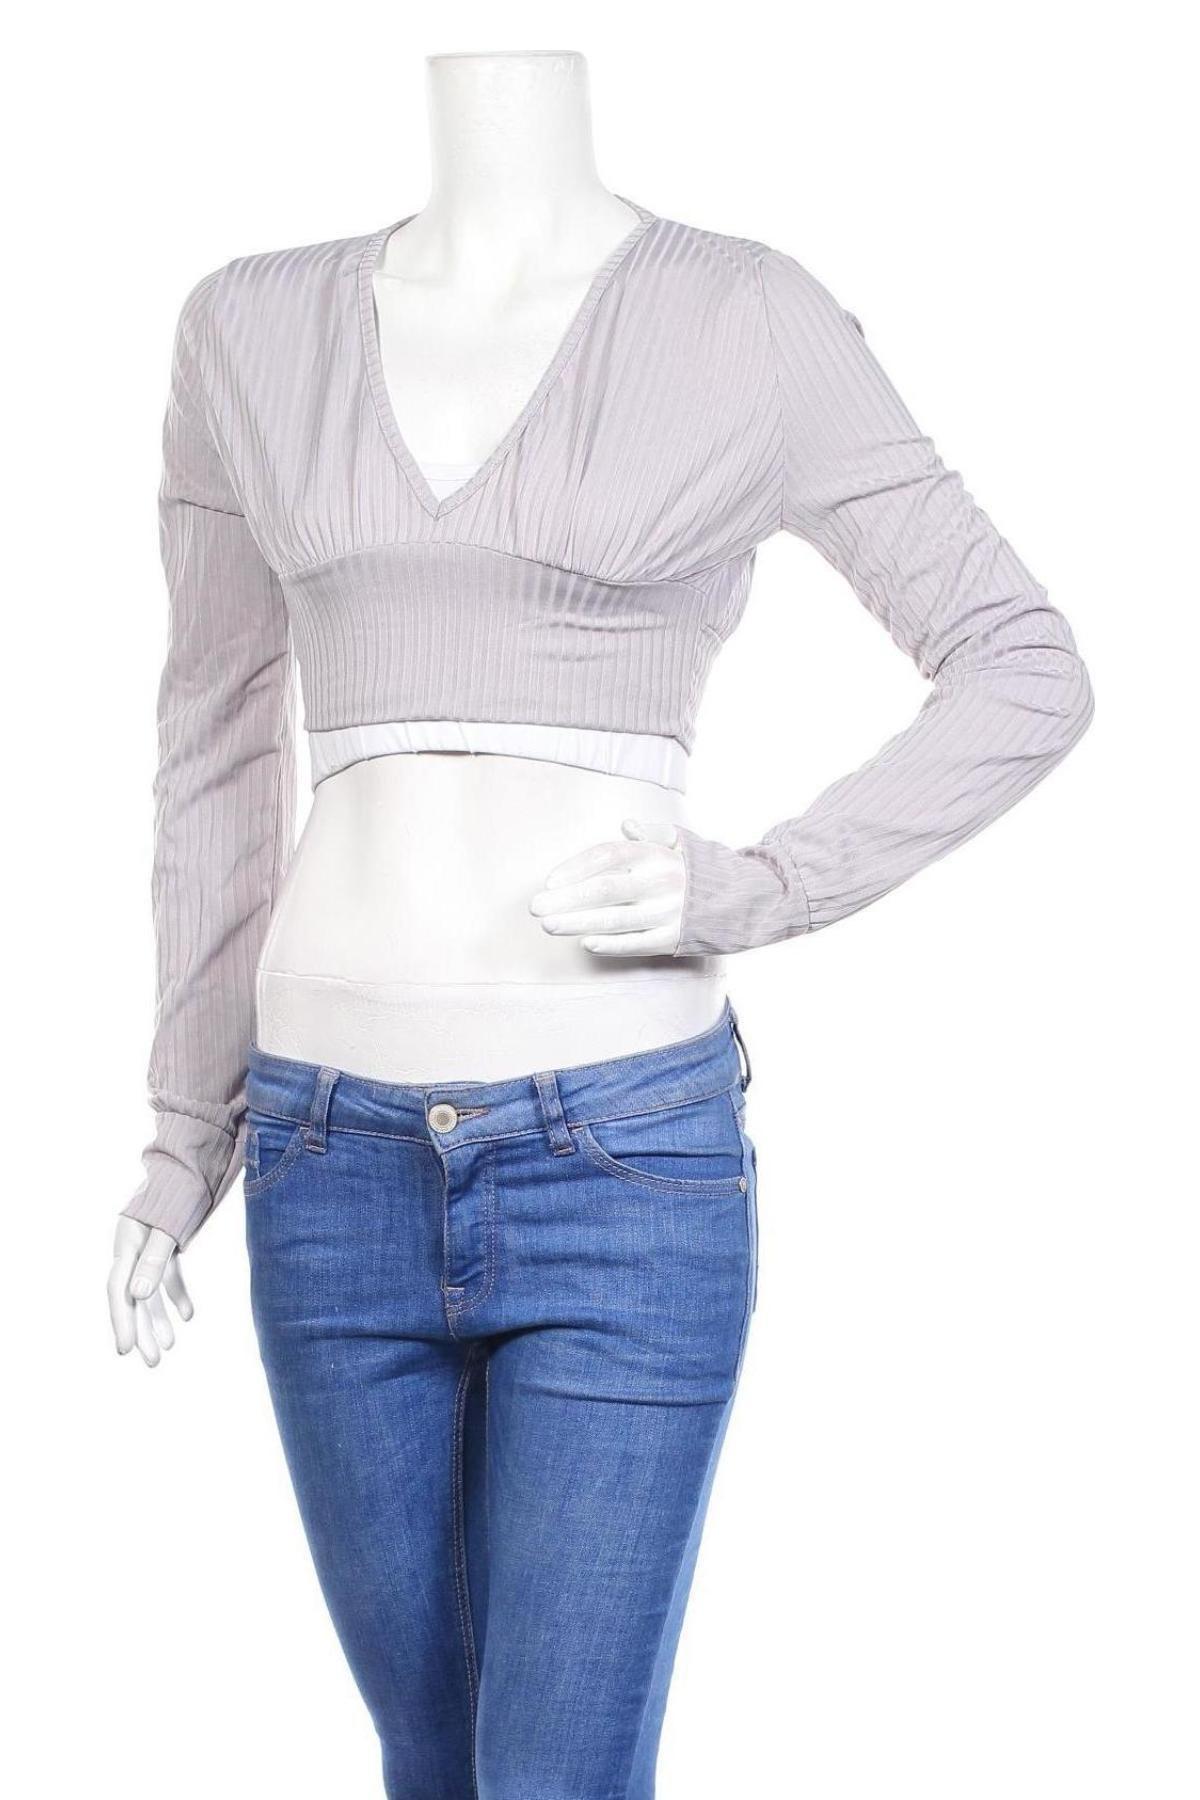 Дамска блуза Stylewise, Размер S, Цвят Лилав, 95% полиестер, 5% еластан, Цена 6,80лв.